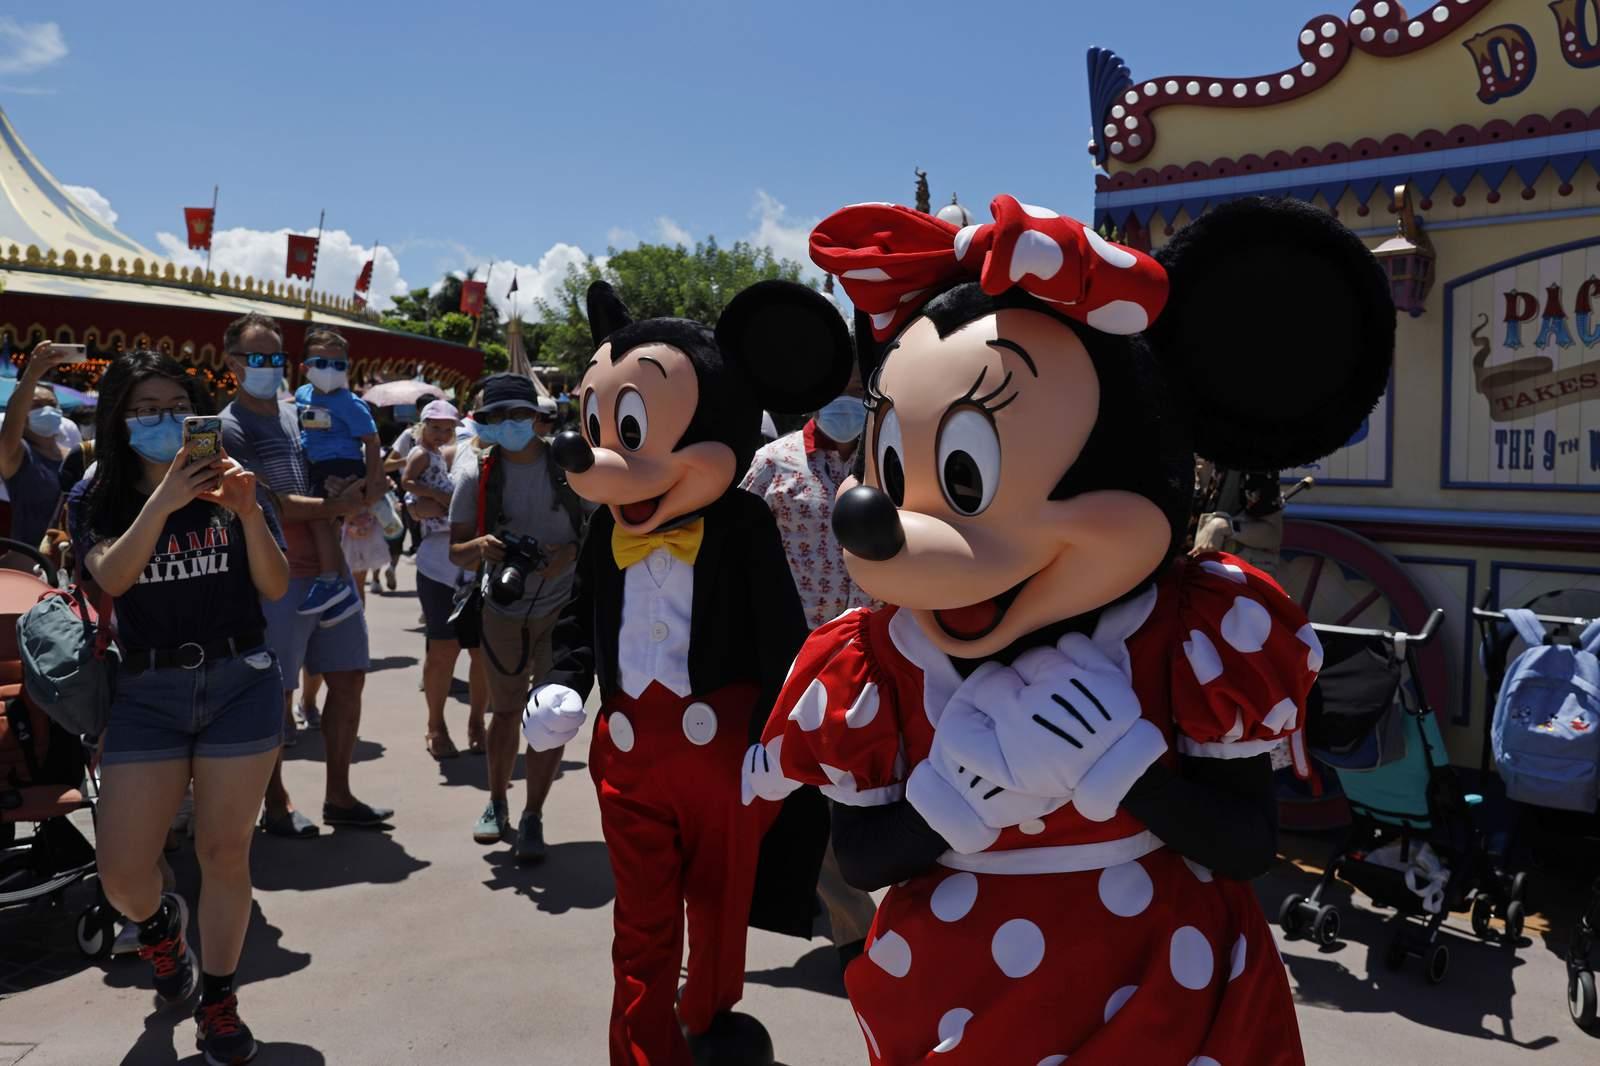 Disneyland Hongkong - تعطیلی مجدد Disneyland در پی شروع موج دوم کرونا در هنگ کنگ!